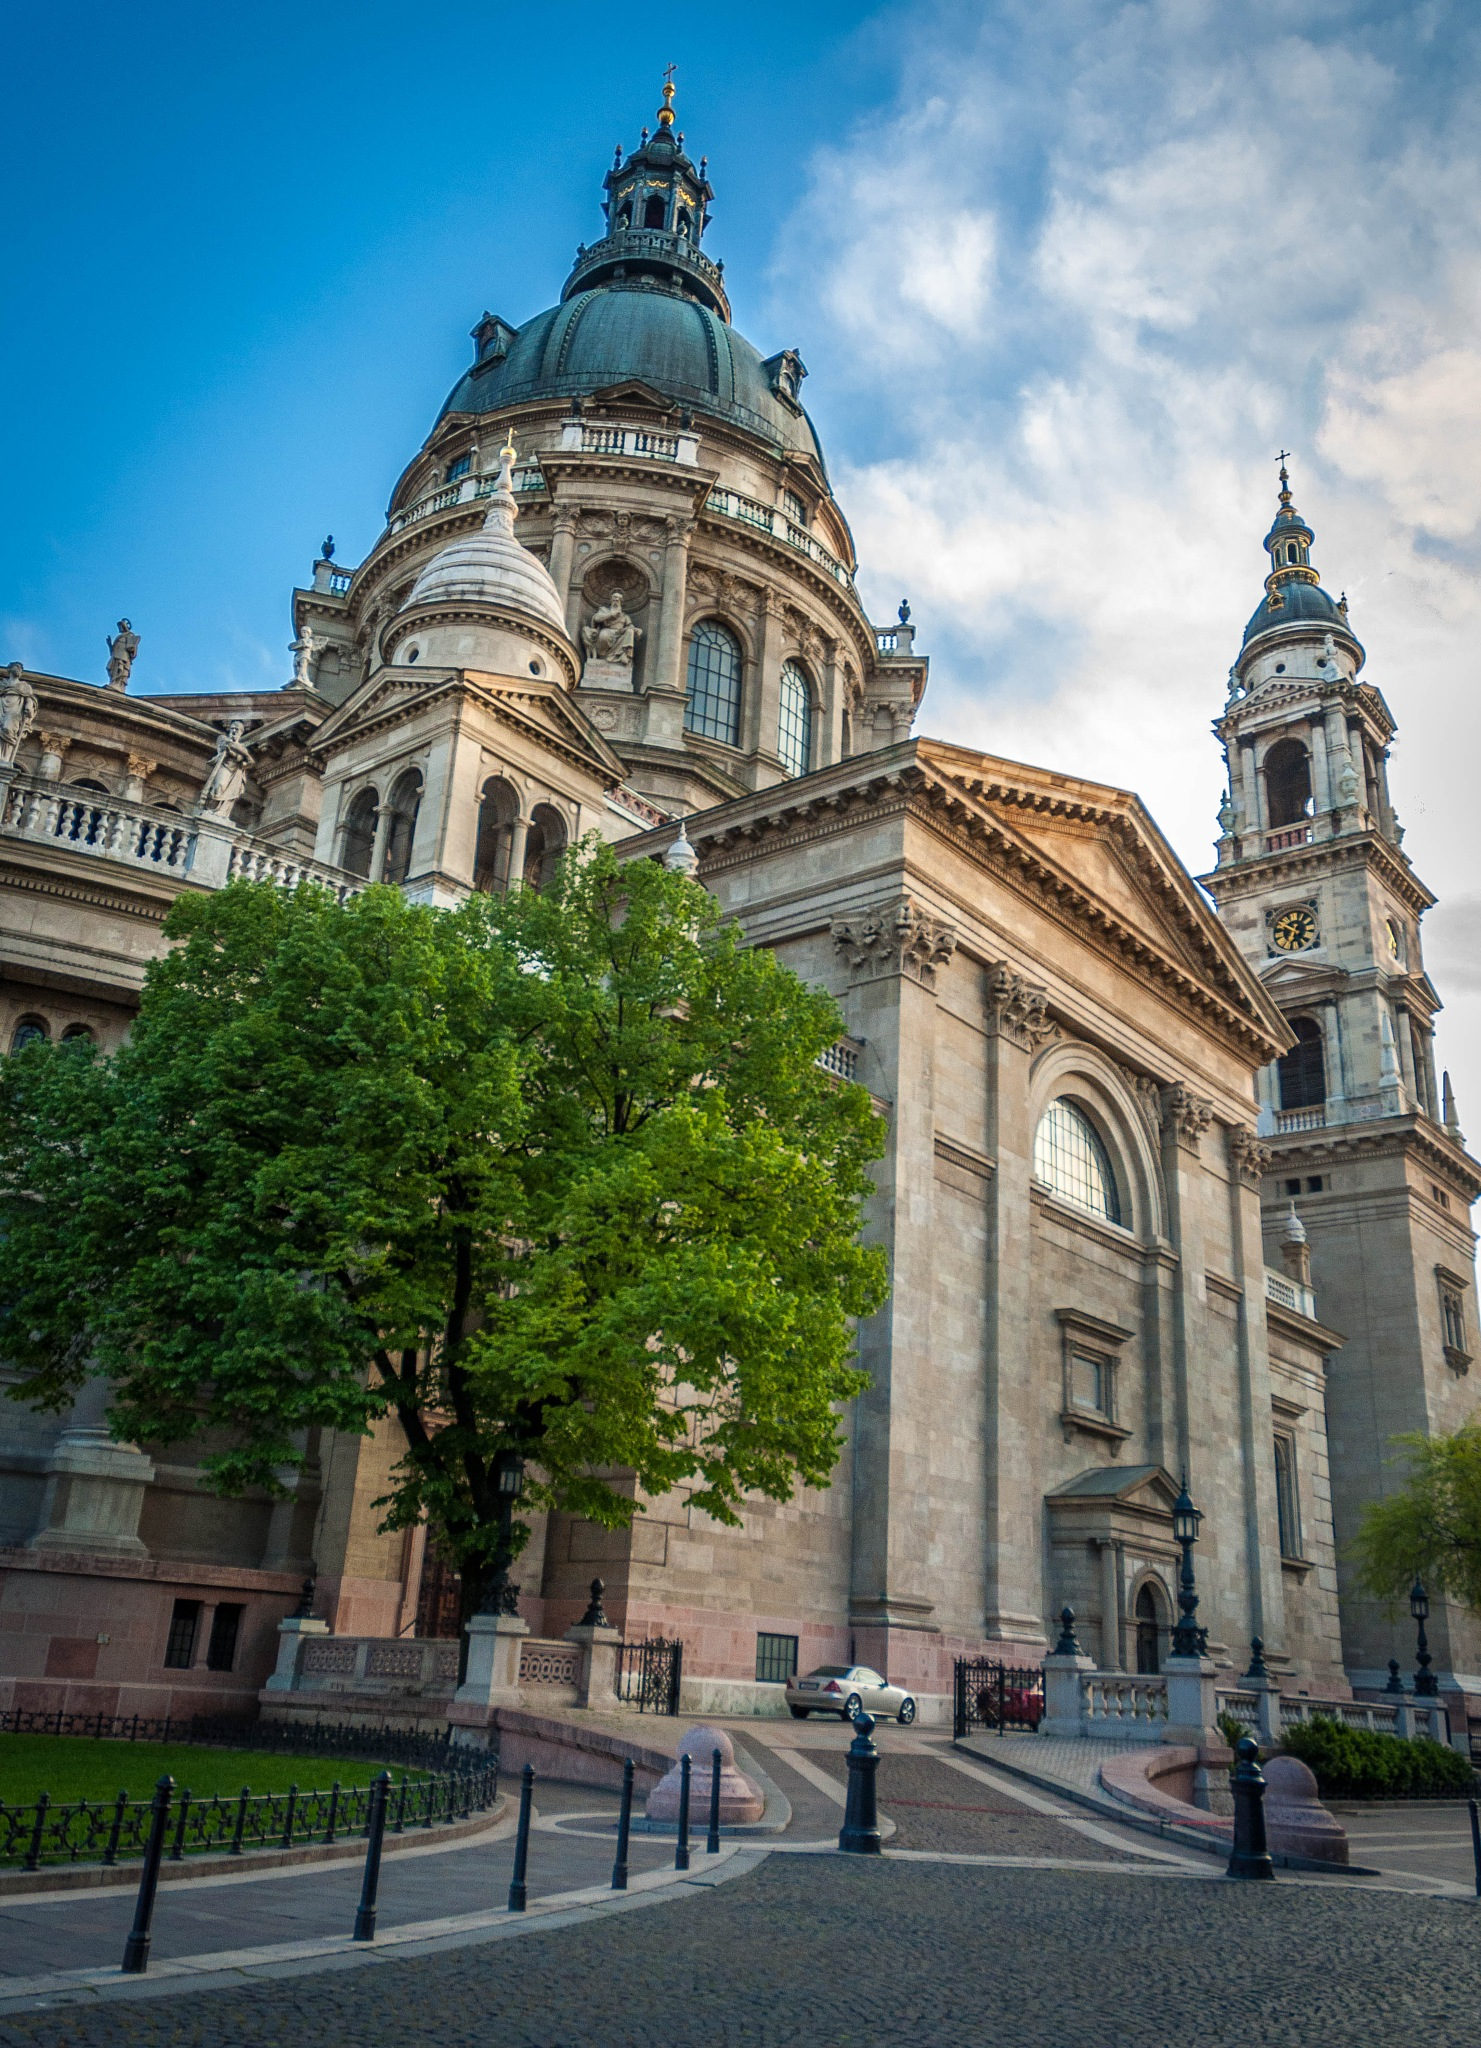 St. Stephen's Basilica ( Budapest) by Gabor Gergely